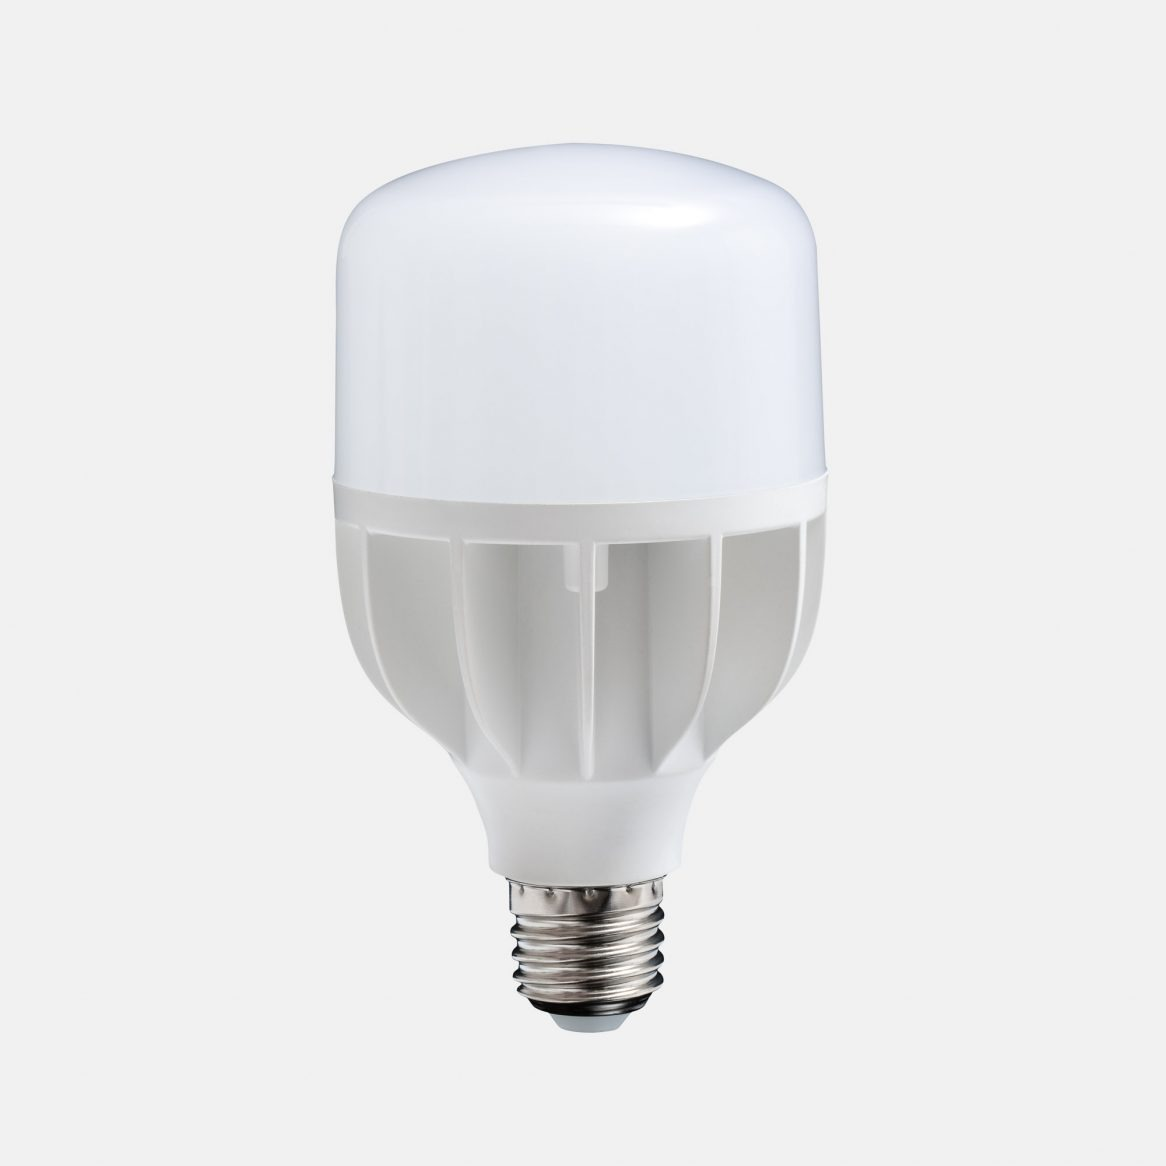 18W daylight LED Bulb